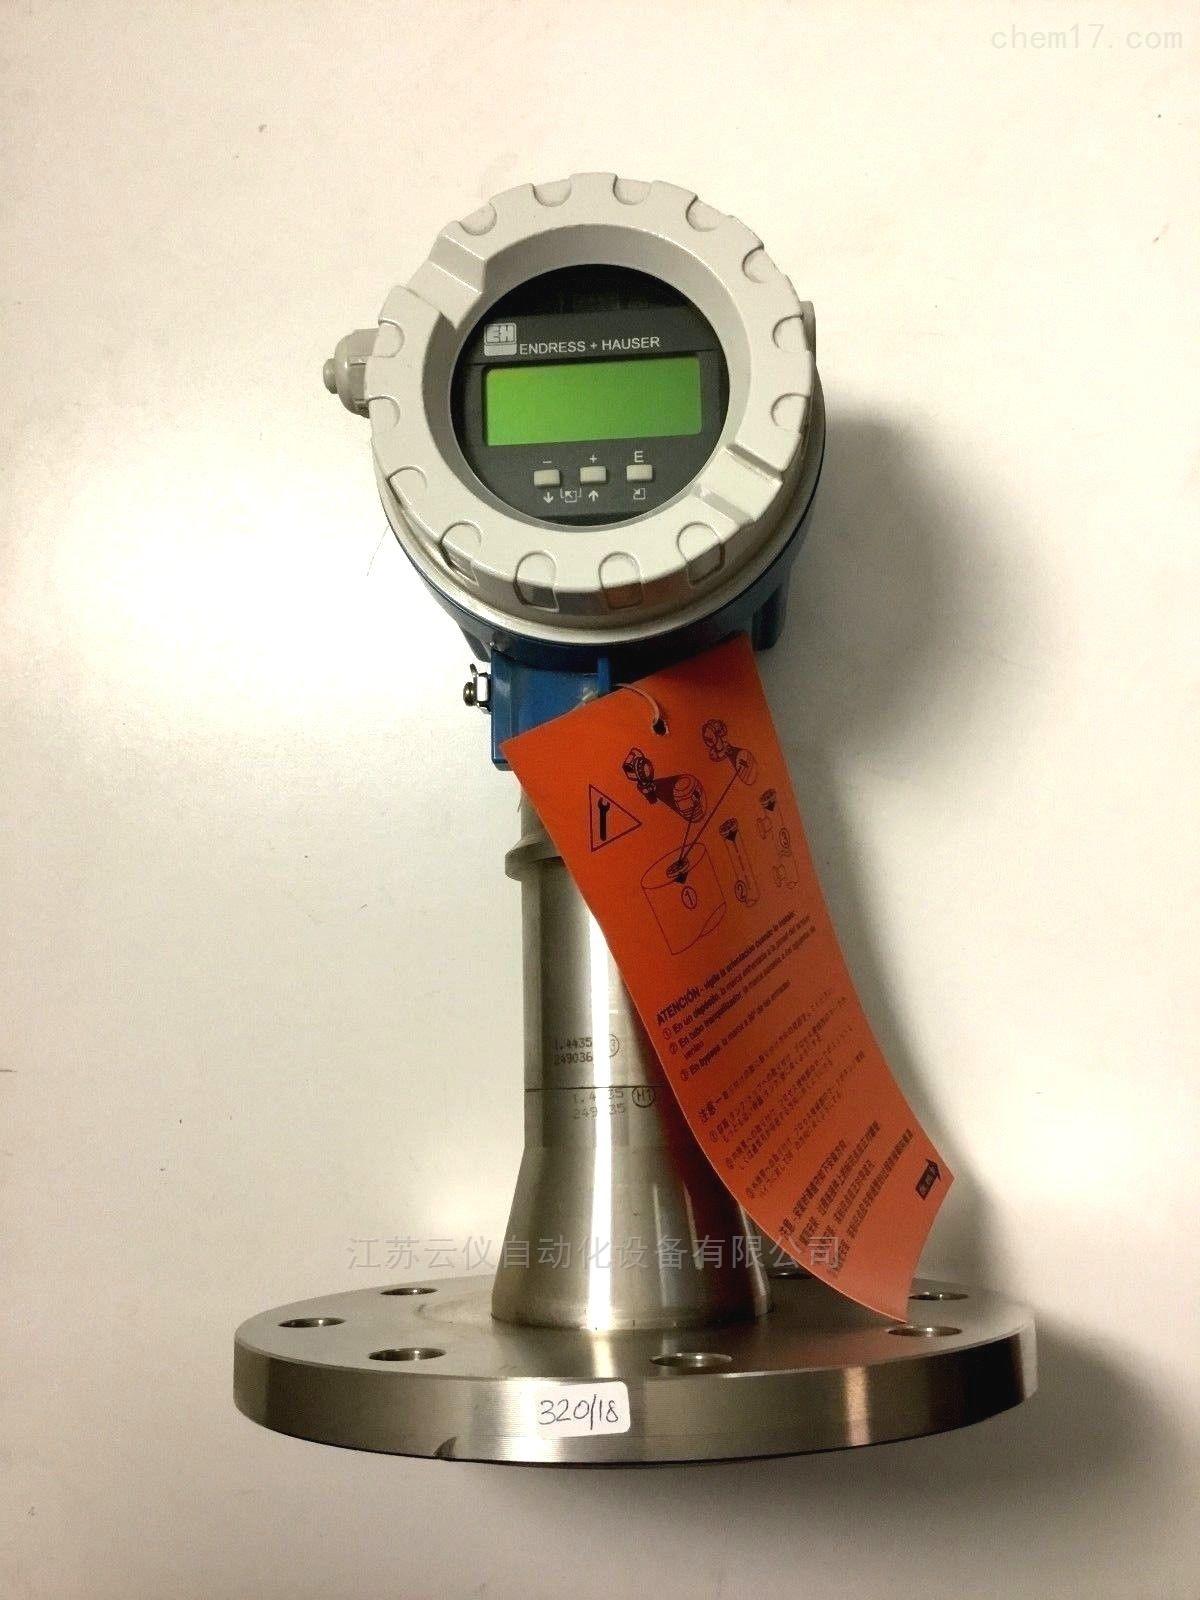 FMR245两线制e+h 雷达物位计 FMR245液位计